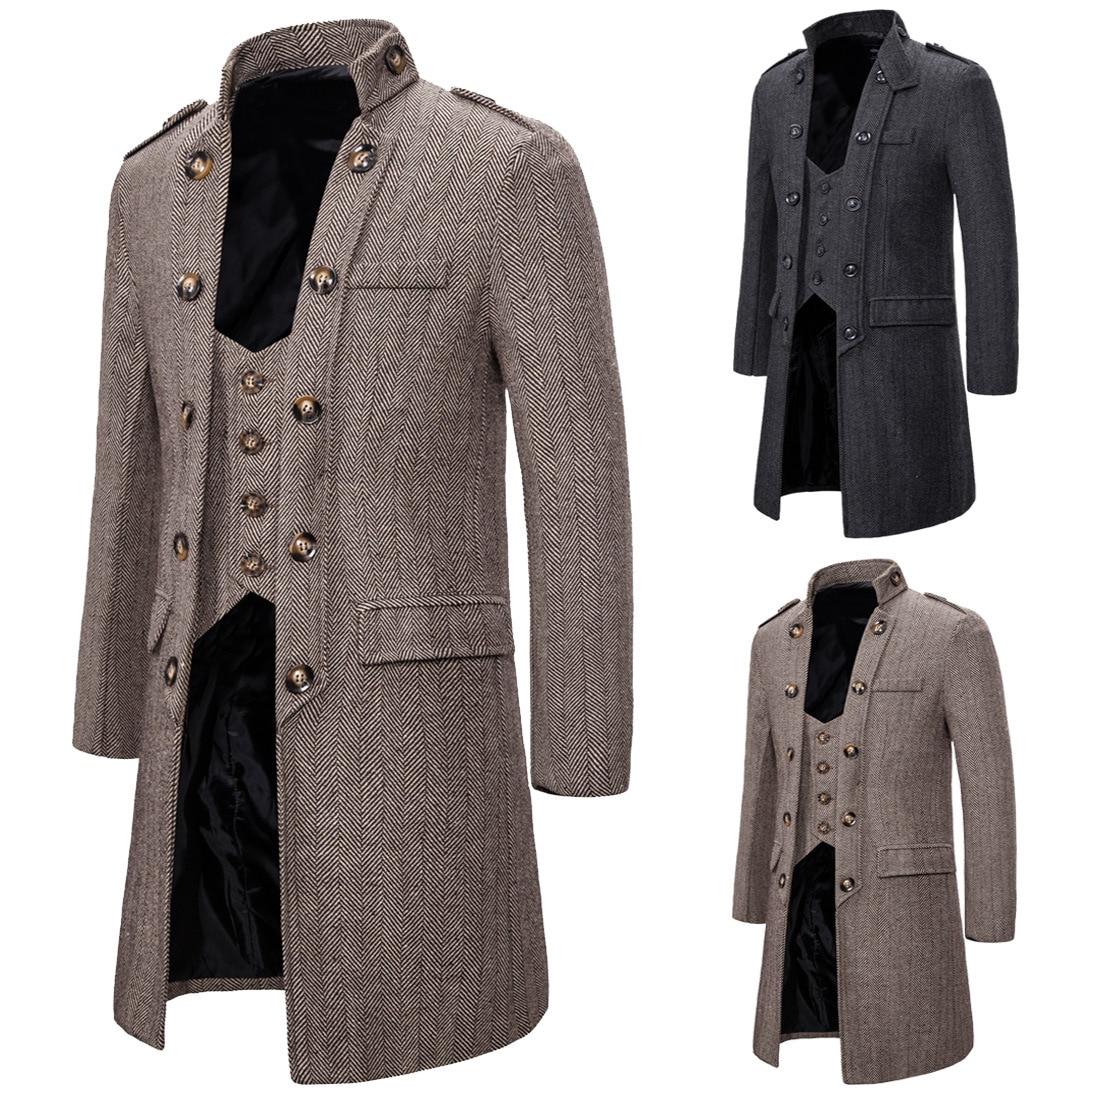 2019 New Style Ouma Coat Mid-length Sportsman Mock Two-Piece Herringbone Duffle Coat   Trench   Coat Yf18